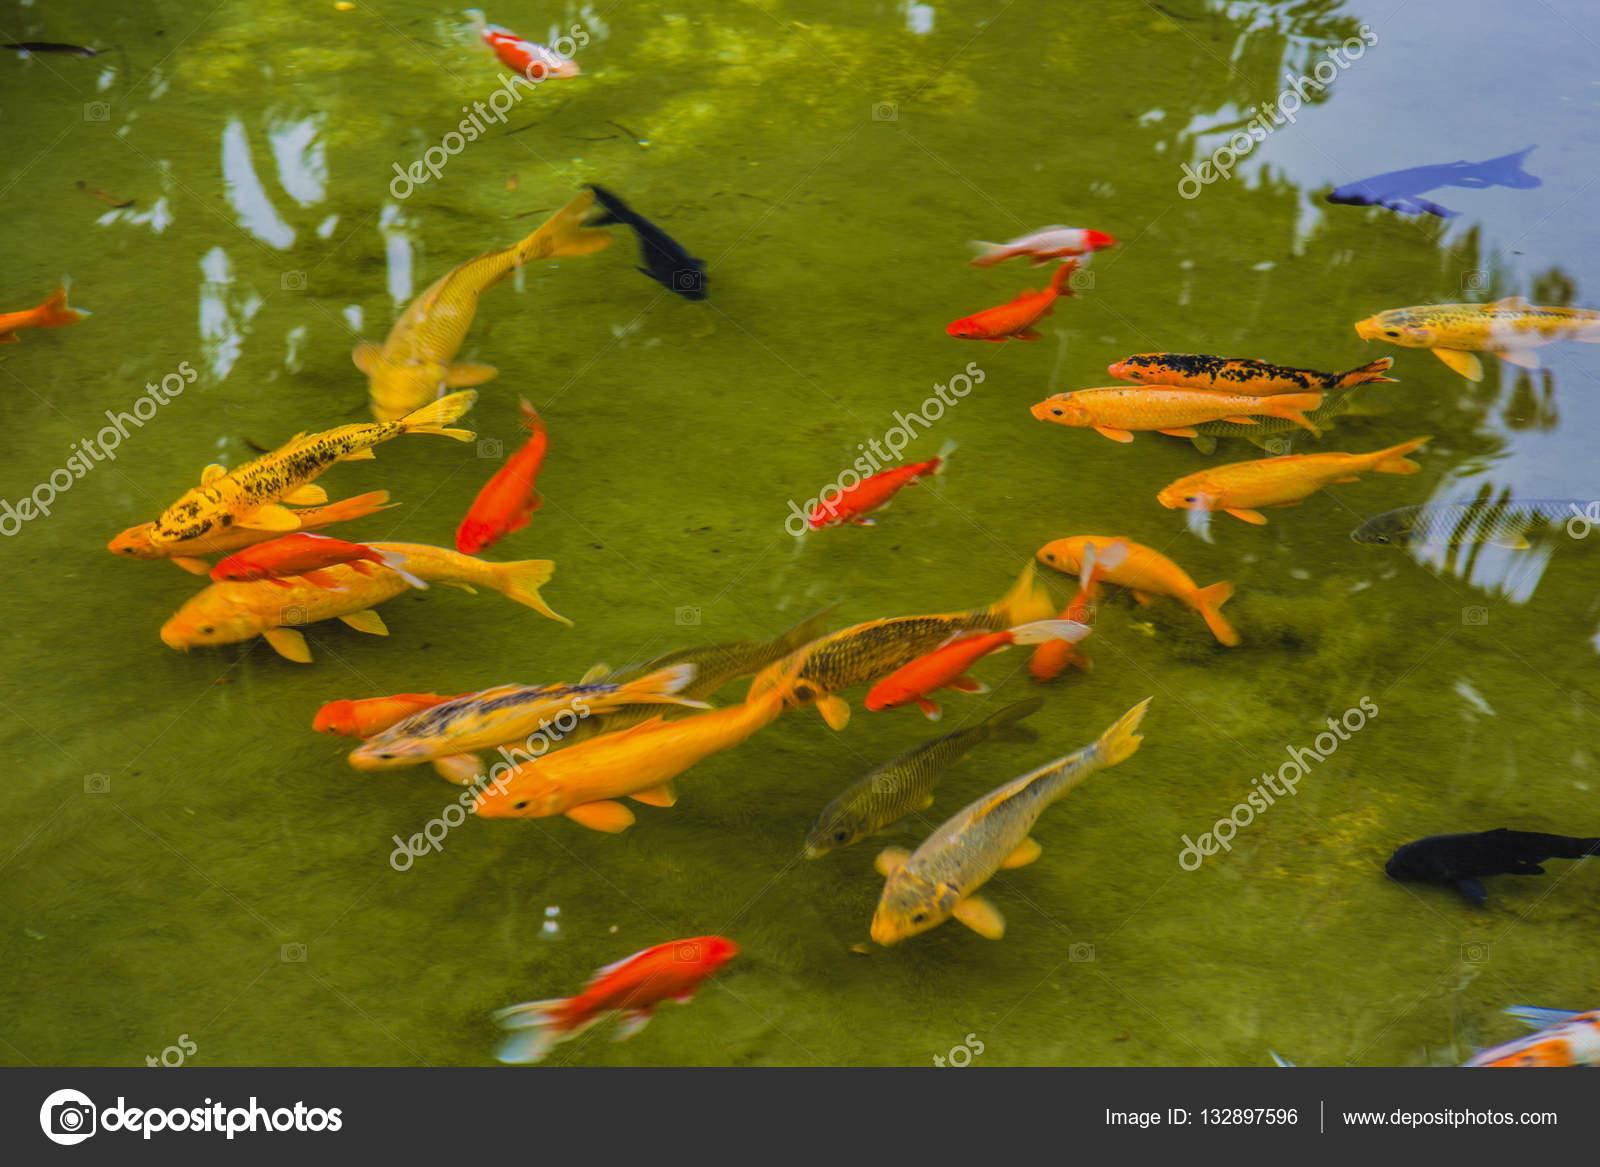 fish inside pond — Stock Photo © 532906574.qq.com #132897596